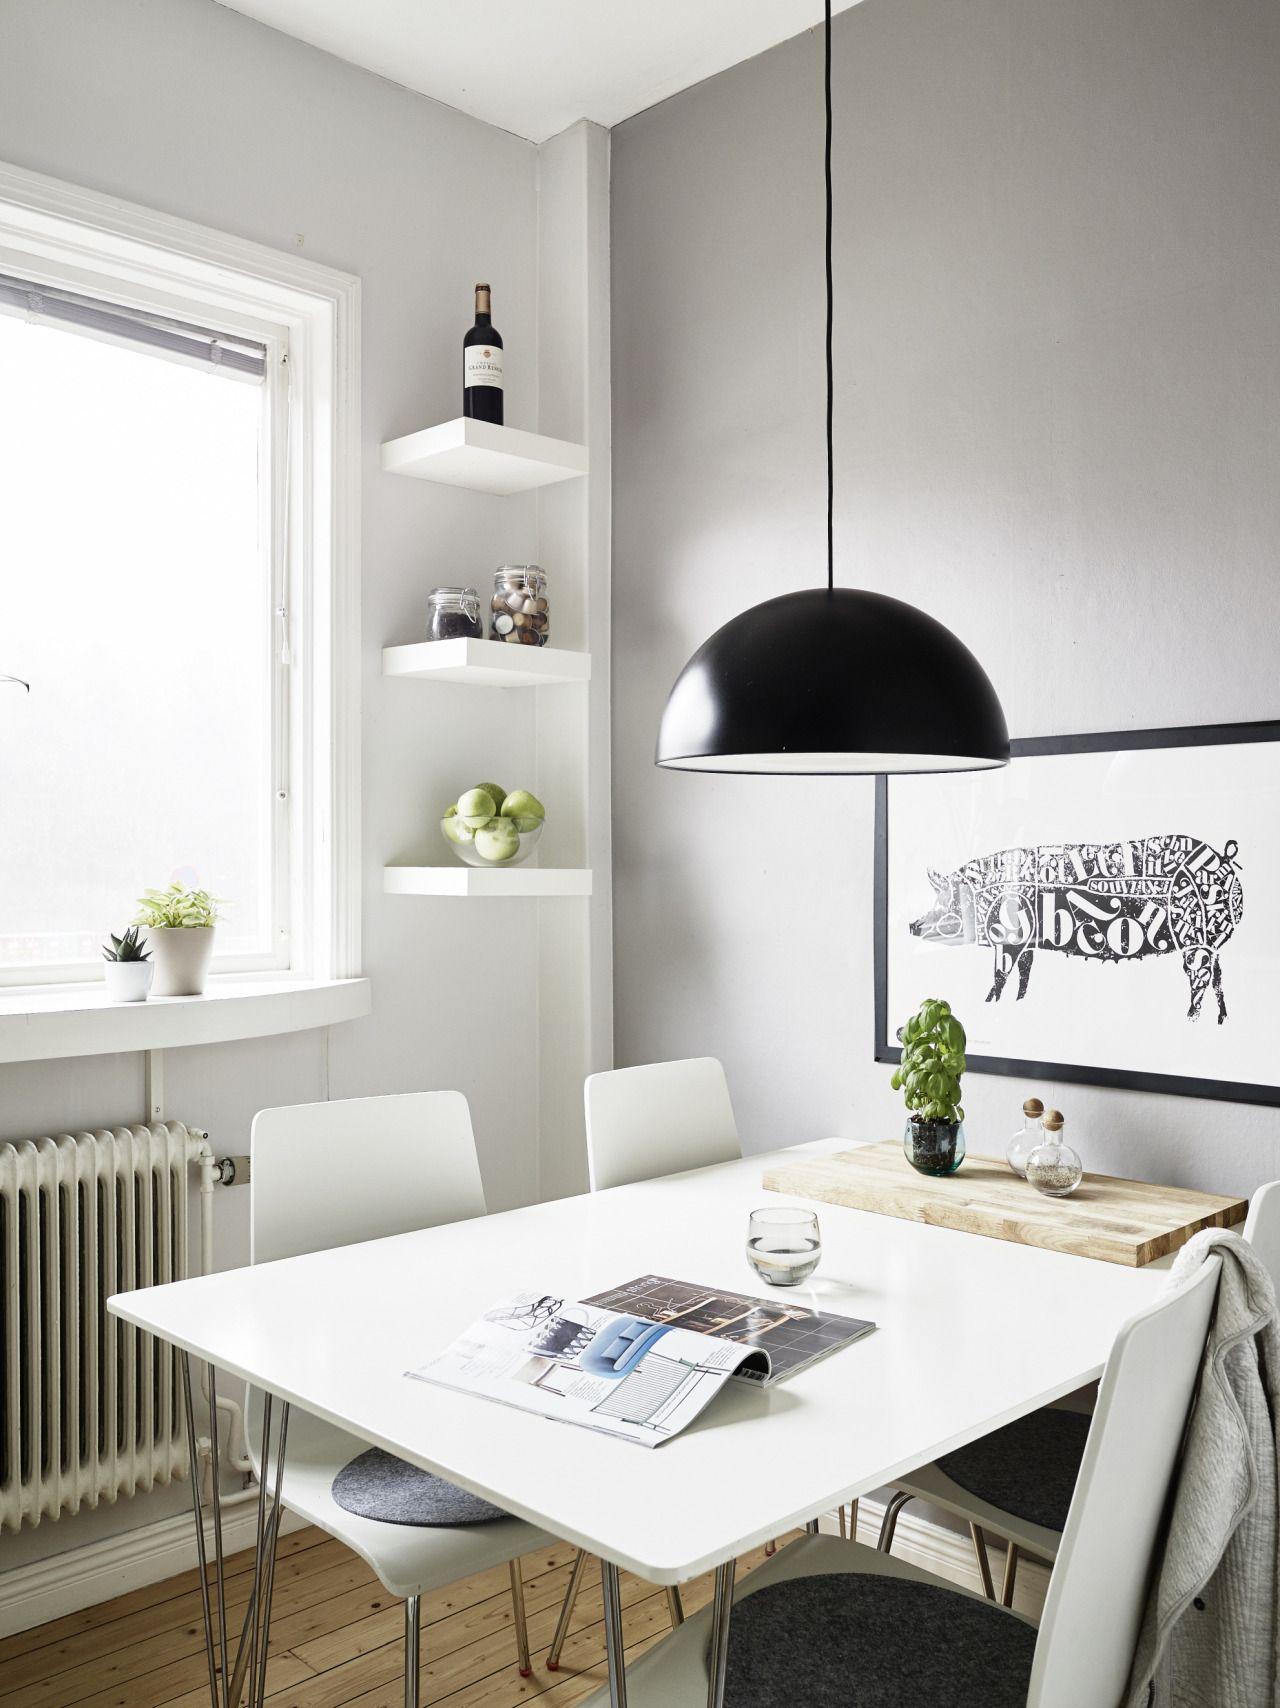 Kitchen Dining Interior Design: Interior Design Dining Room, Modern